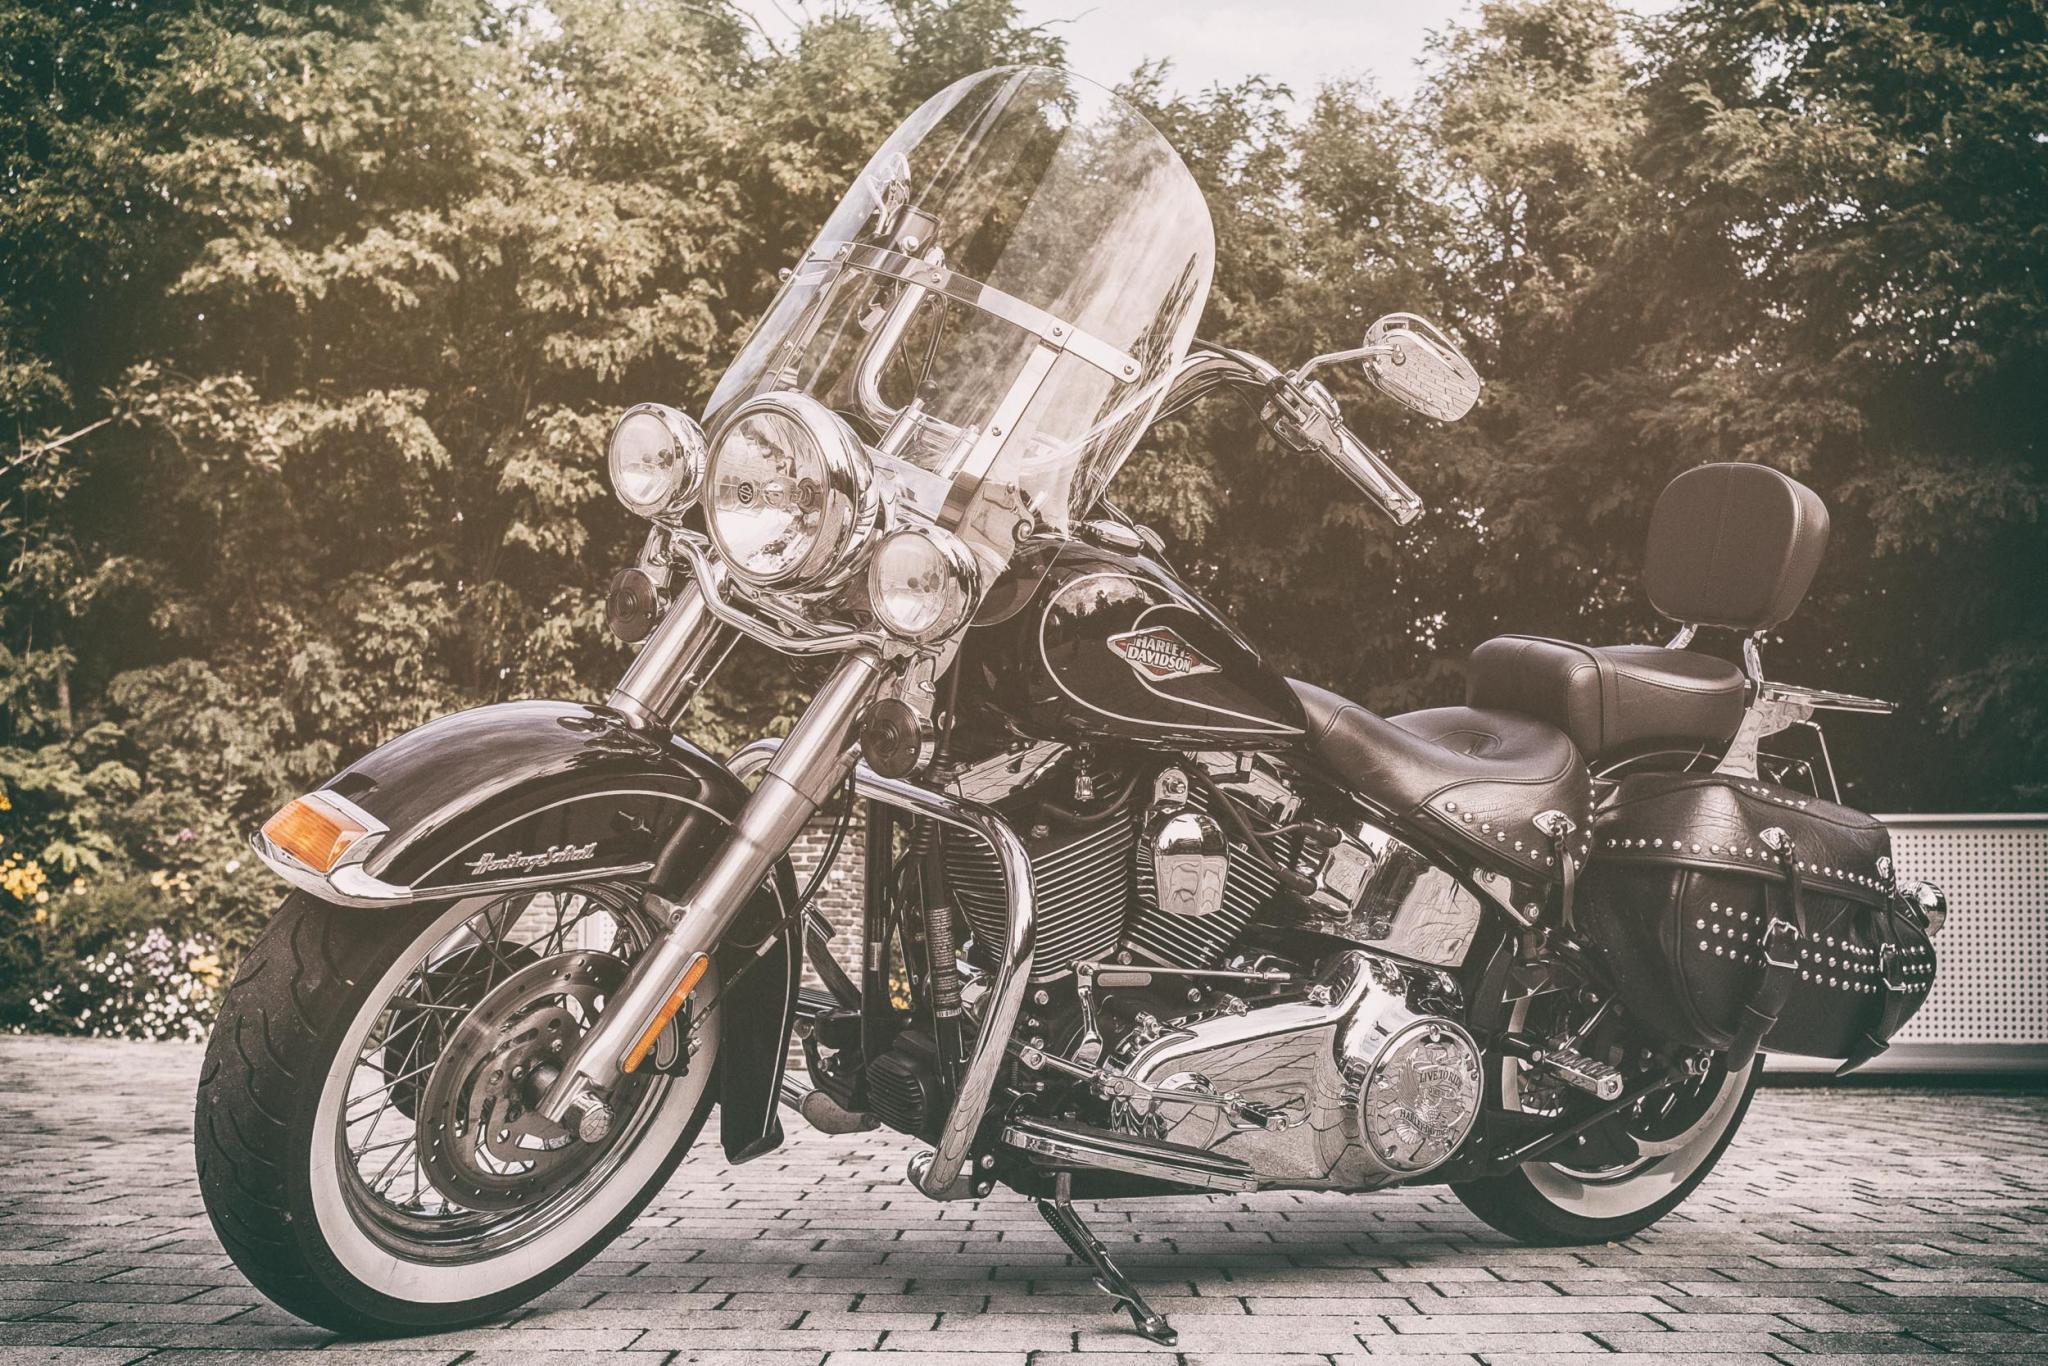 harley davidson heritage softail classic motorrad fotos motorrad bilder. Black Bedroom Furniture Sets. Home Design Ideas